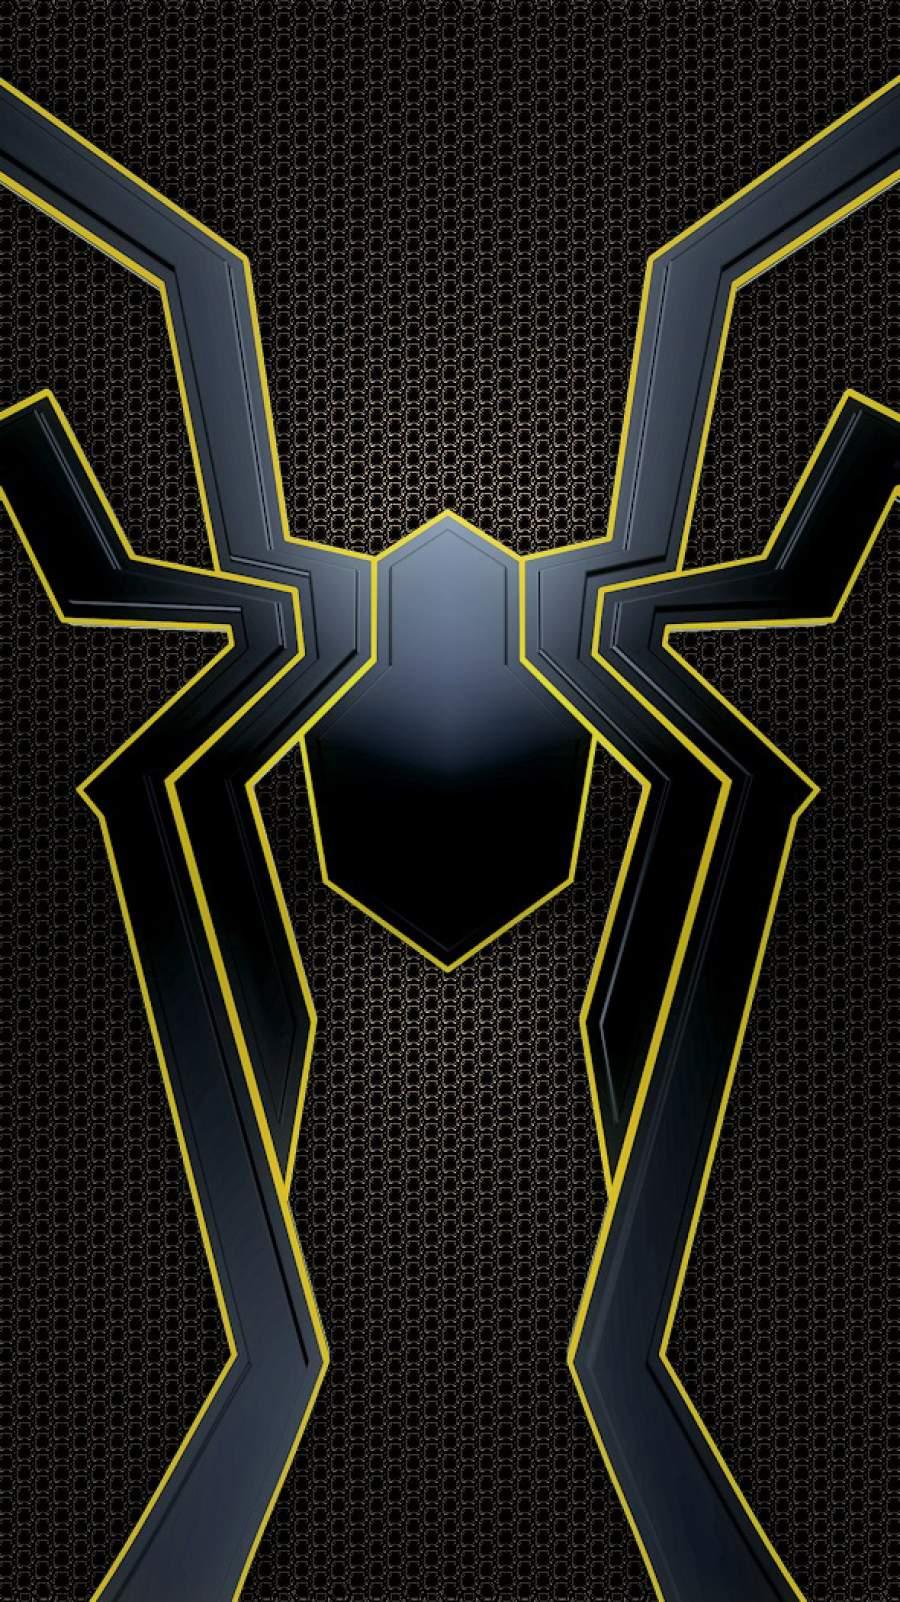 Stealth Spiderman iPhone Wallpaper 1